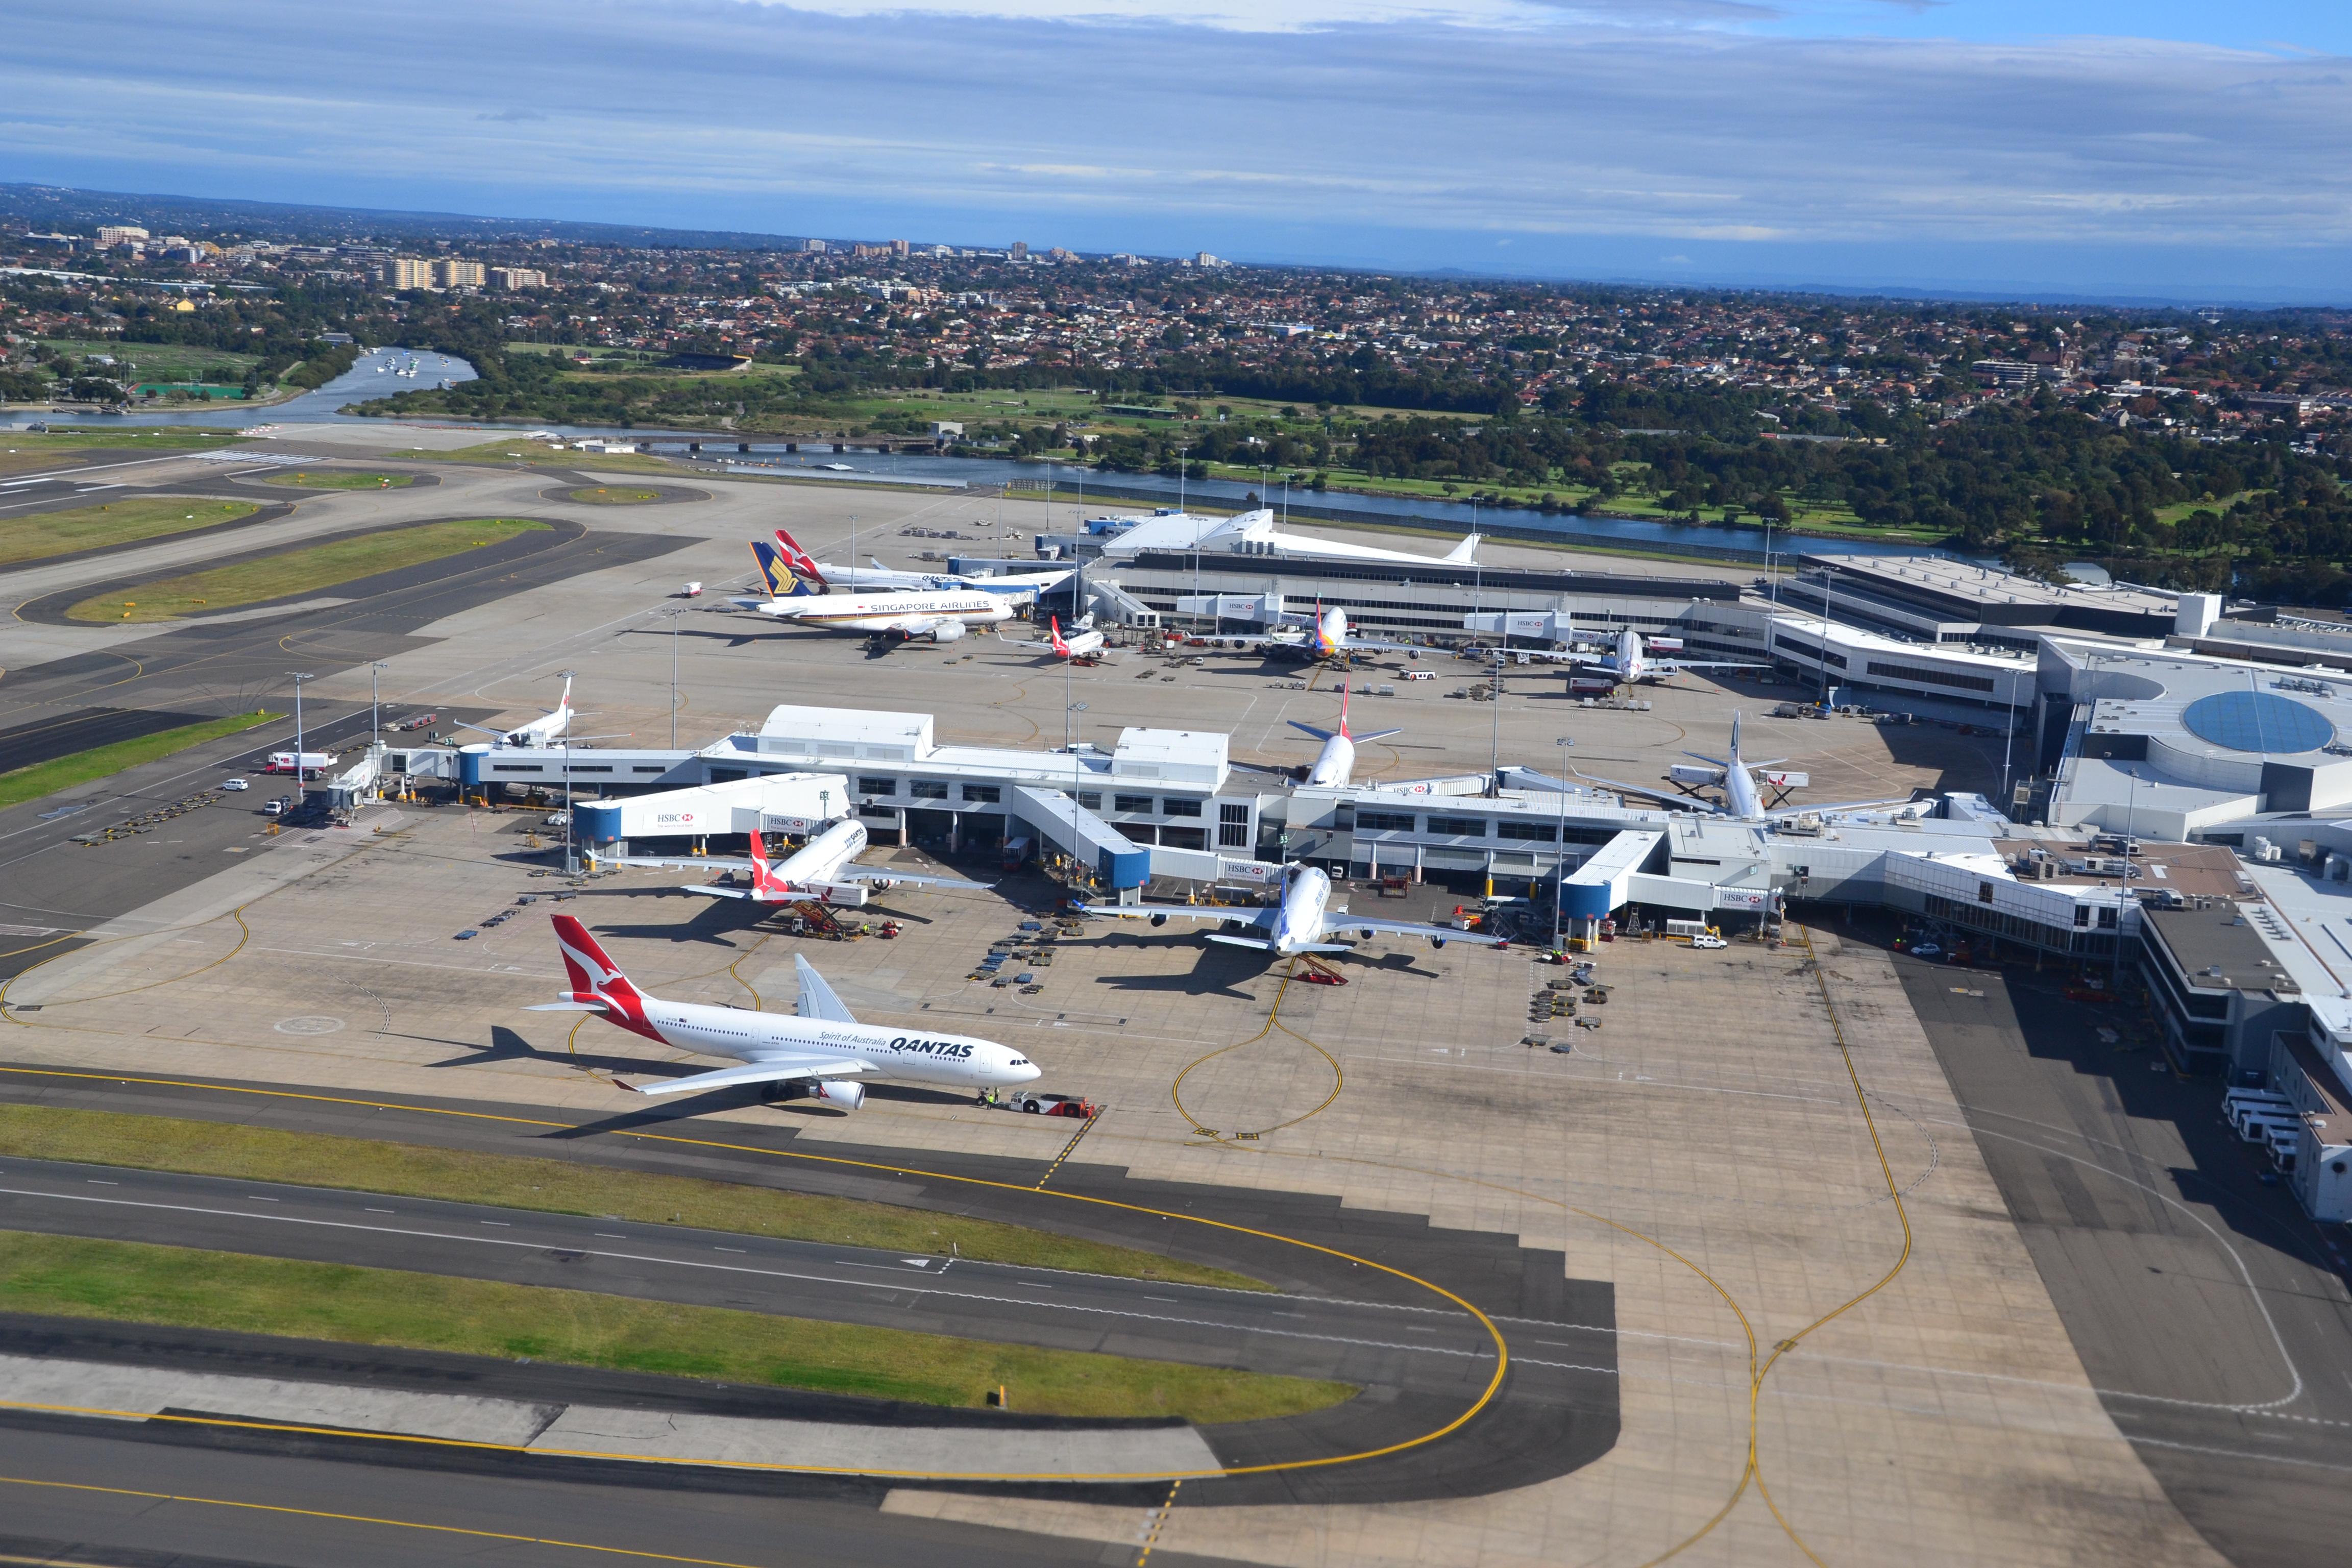 sydney airport - photo #1